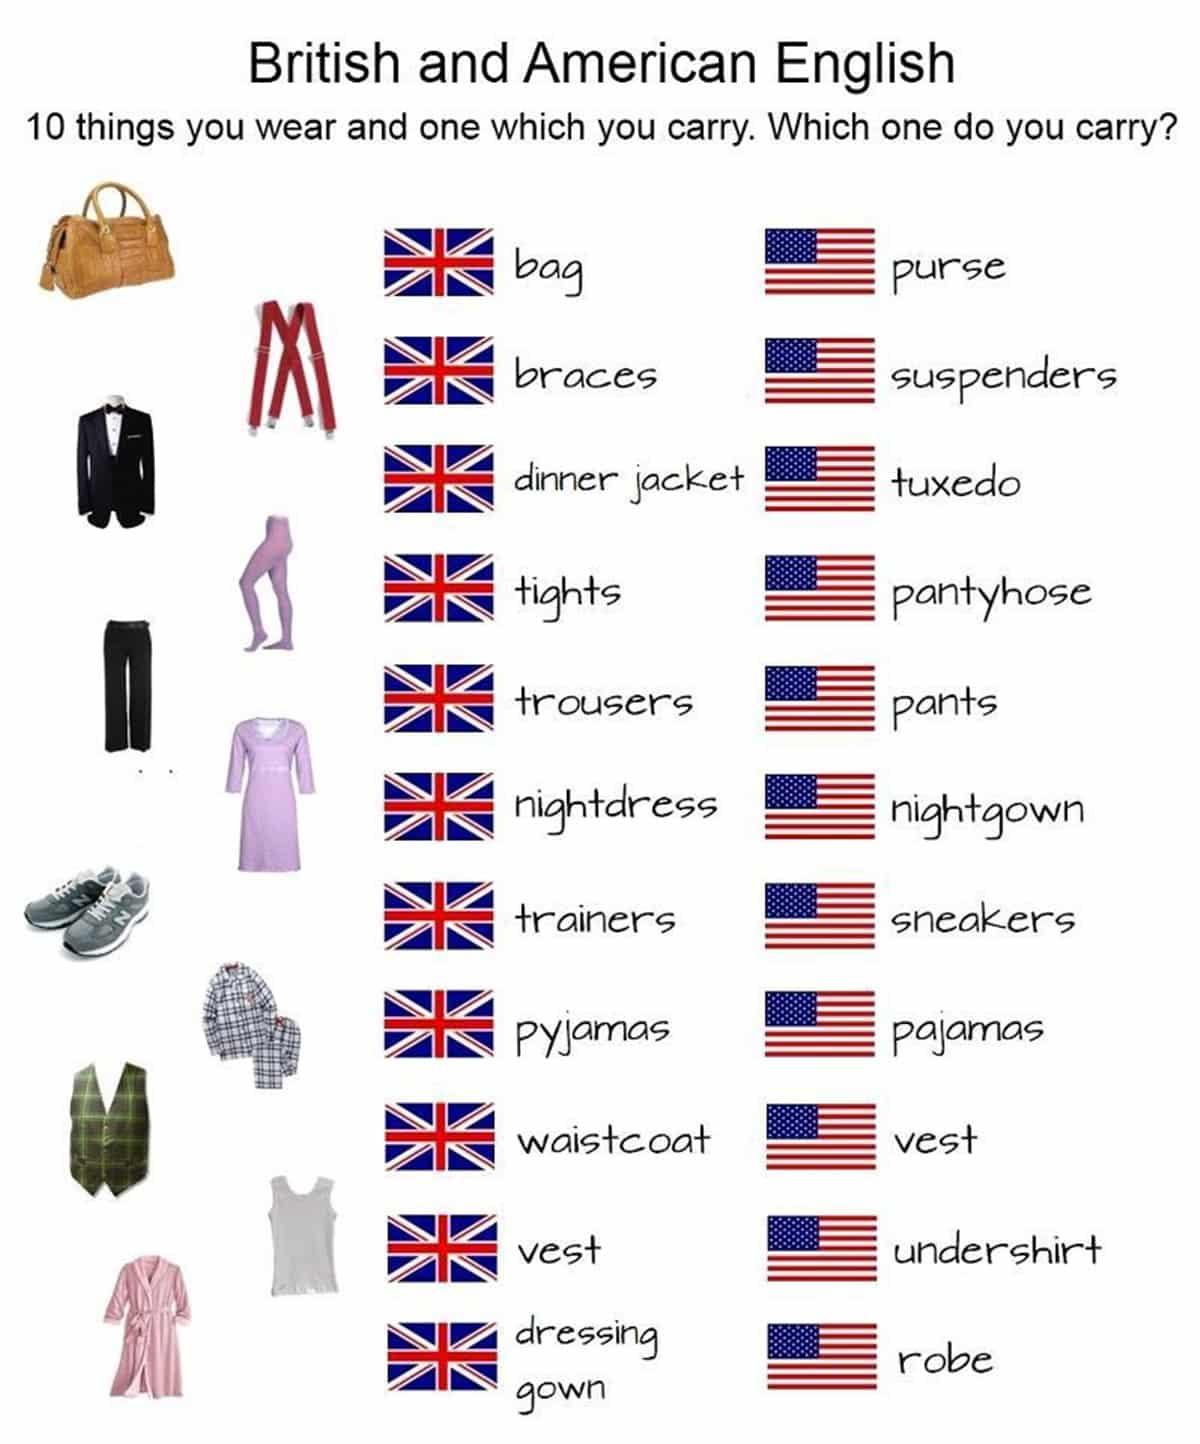 Comparison of British and American English